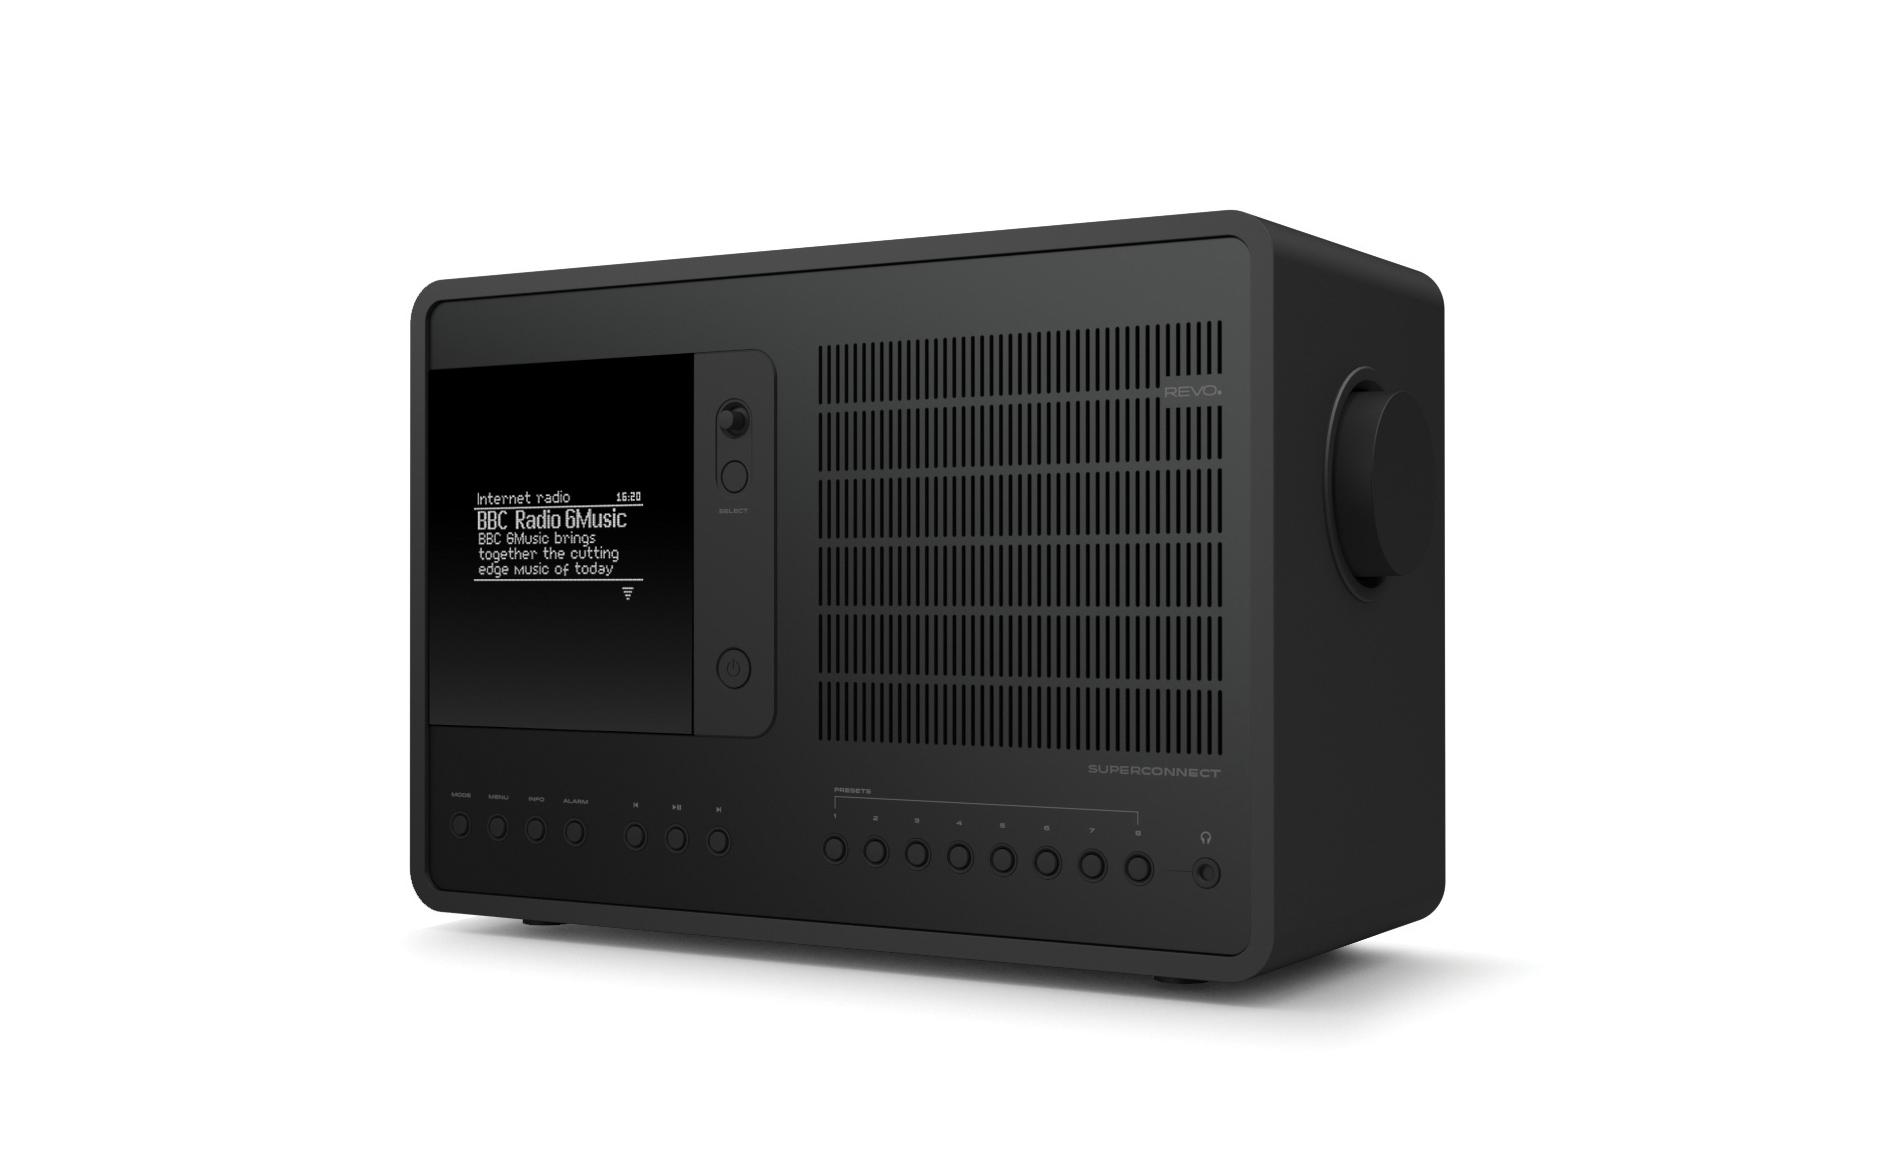 revo-Super-Connect-Shadow